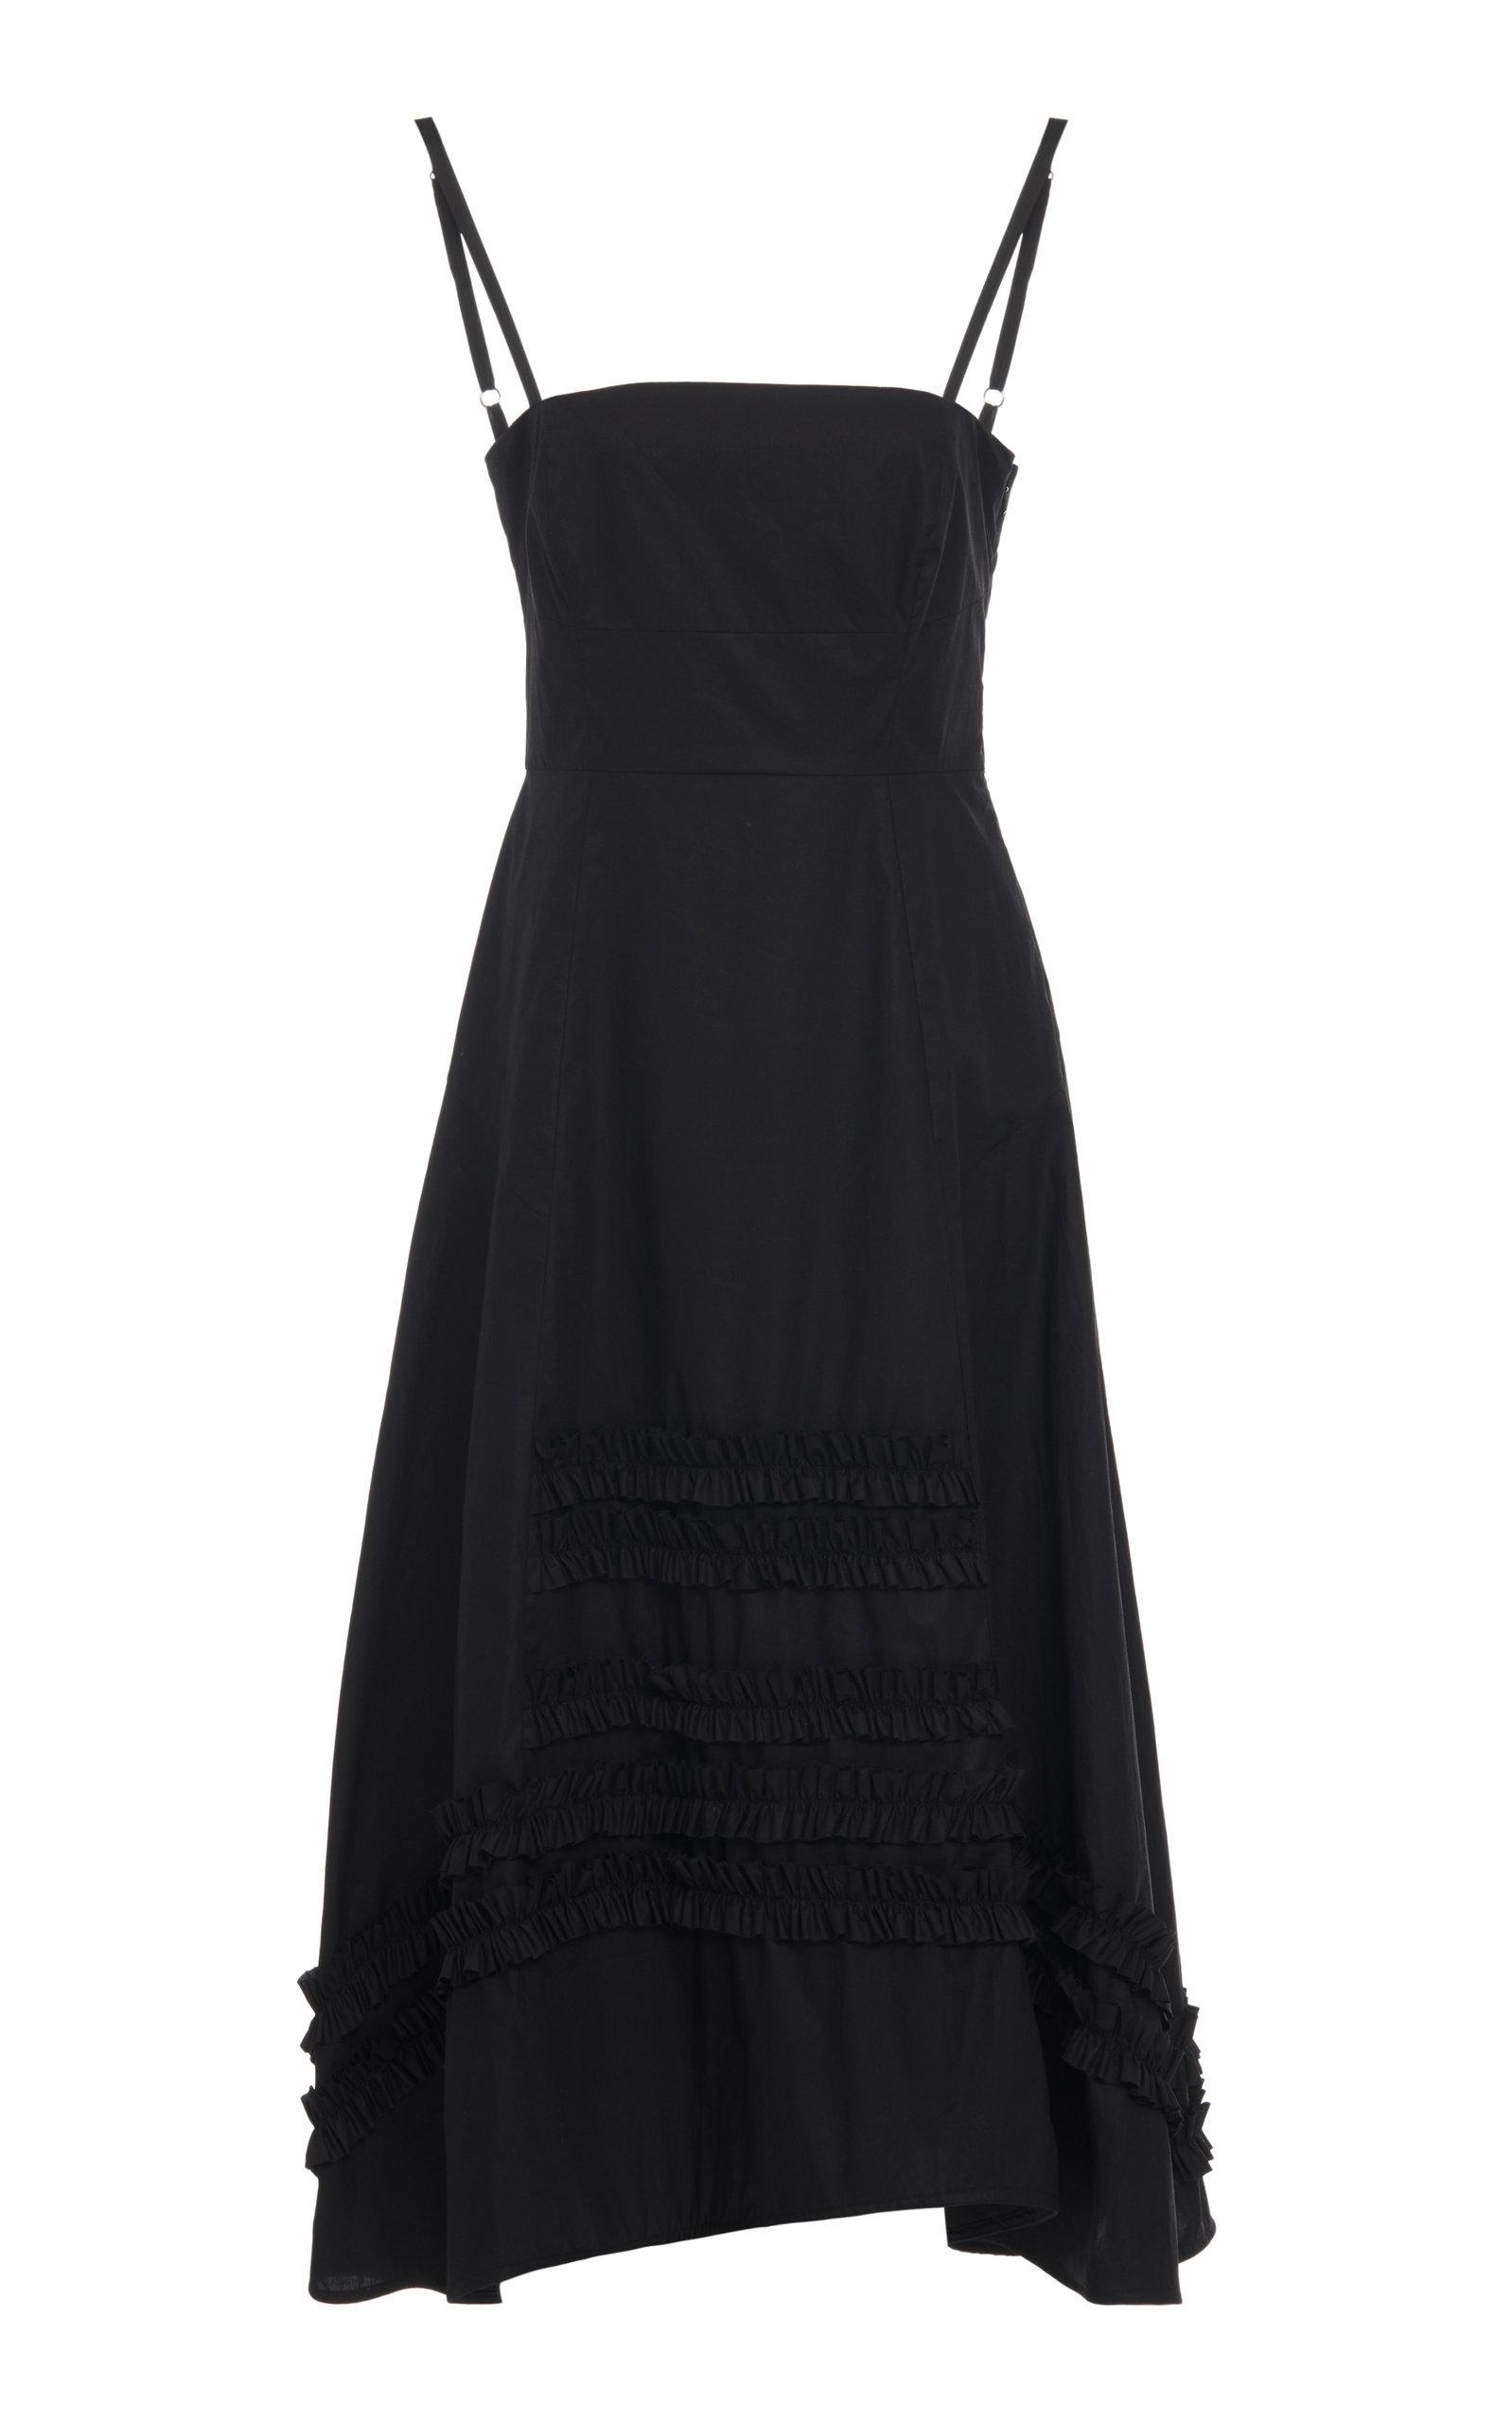 Buy Molly Goddard Flavio Ruffled Cotton Midi Dress online, shop Molly Goddard at the best price